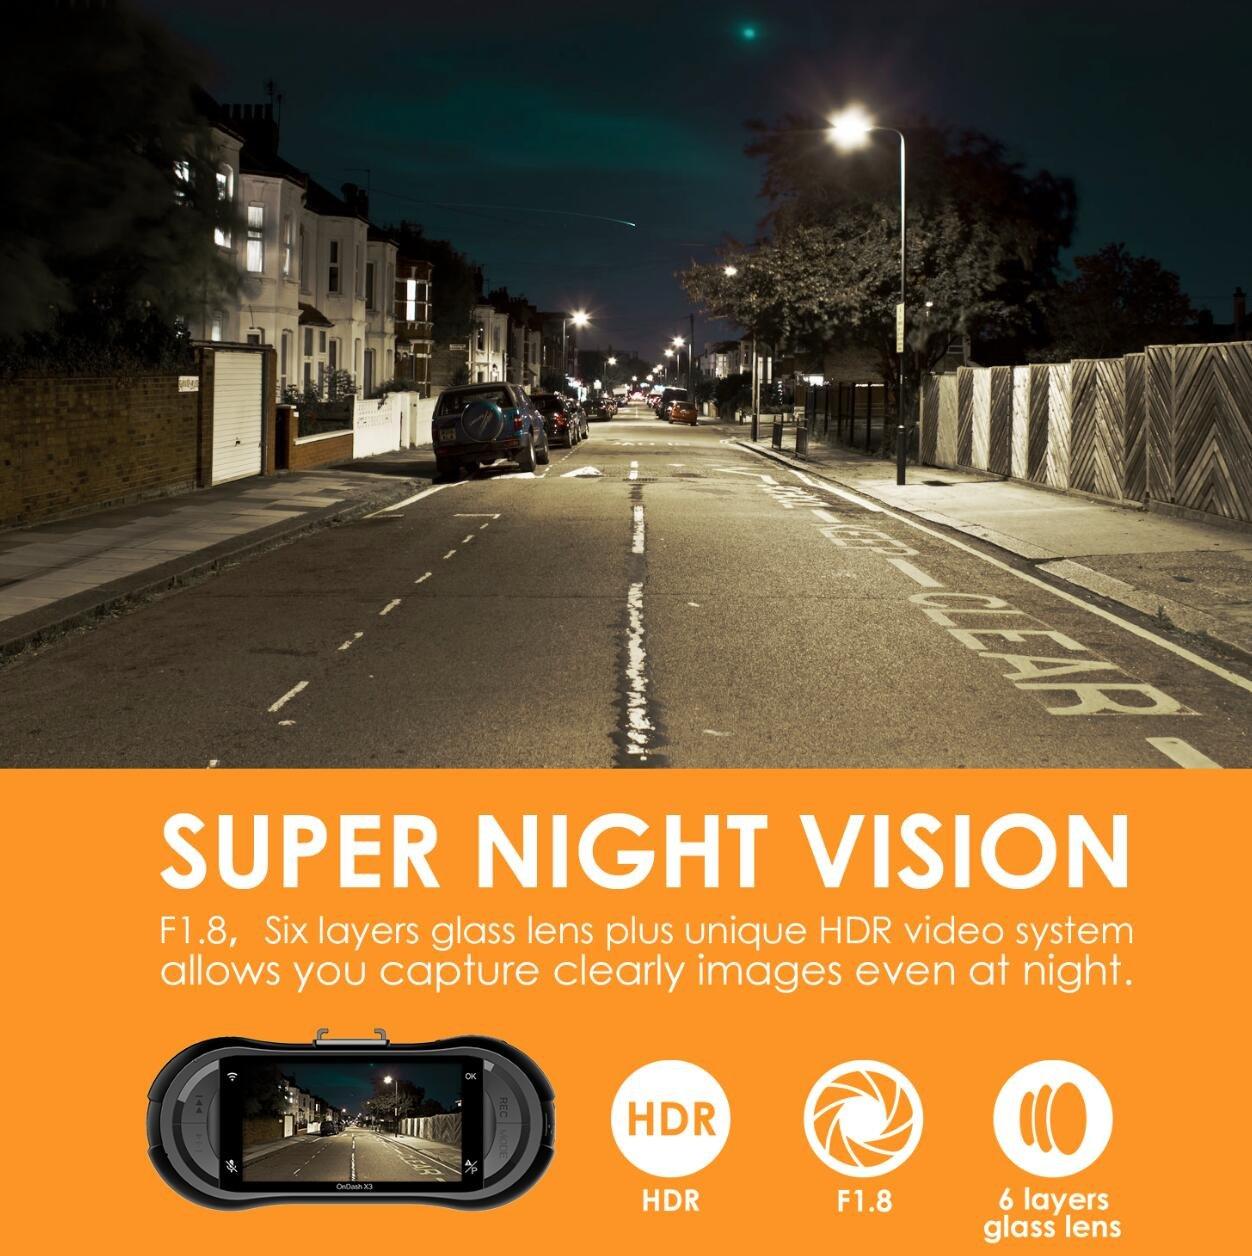 Vantrue X3 WIFI Dash Cam, Super HD 2.5K Car Dashboard Camera 1440P Car Camera with Ambarella A12 Chipset, 170°Wide Angle, Super HDR Night Vision, Loop Recording, Parking Mode, Motion Detection by VANTRUE (Image #4)